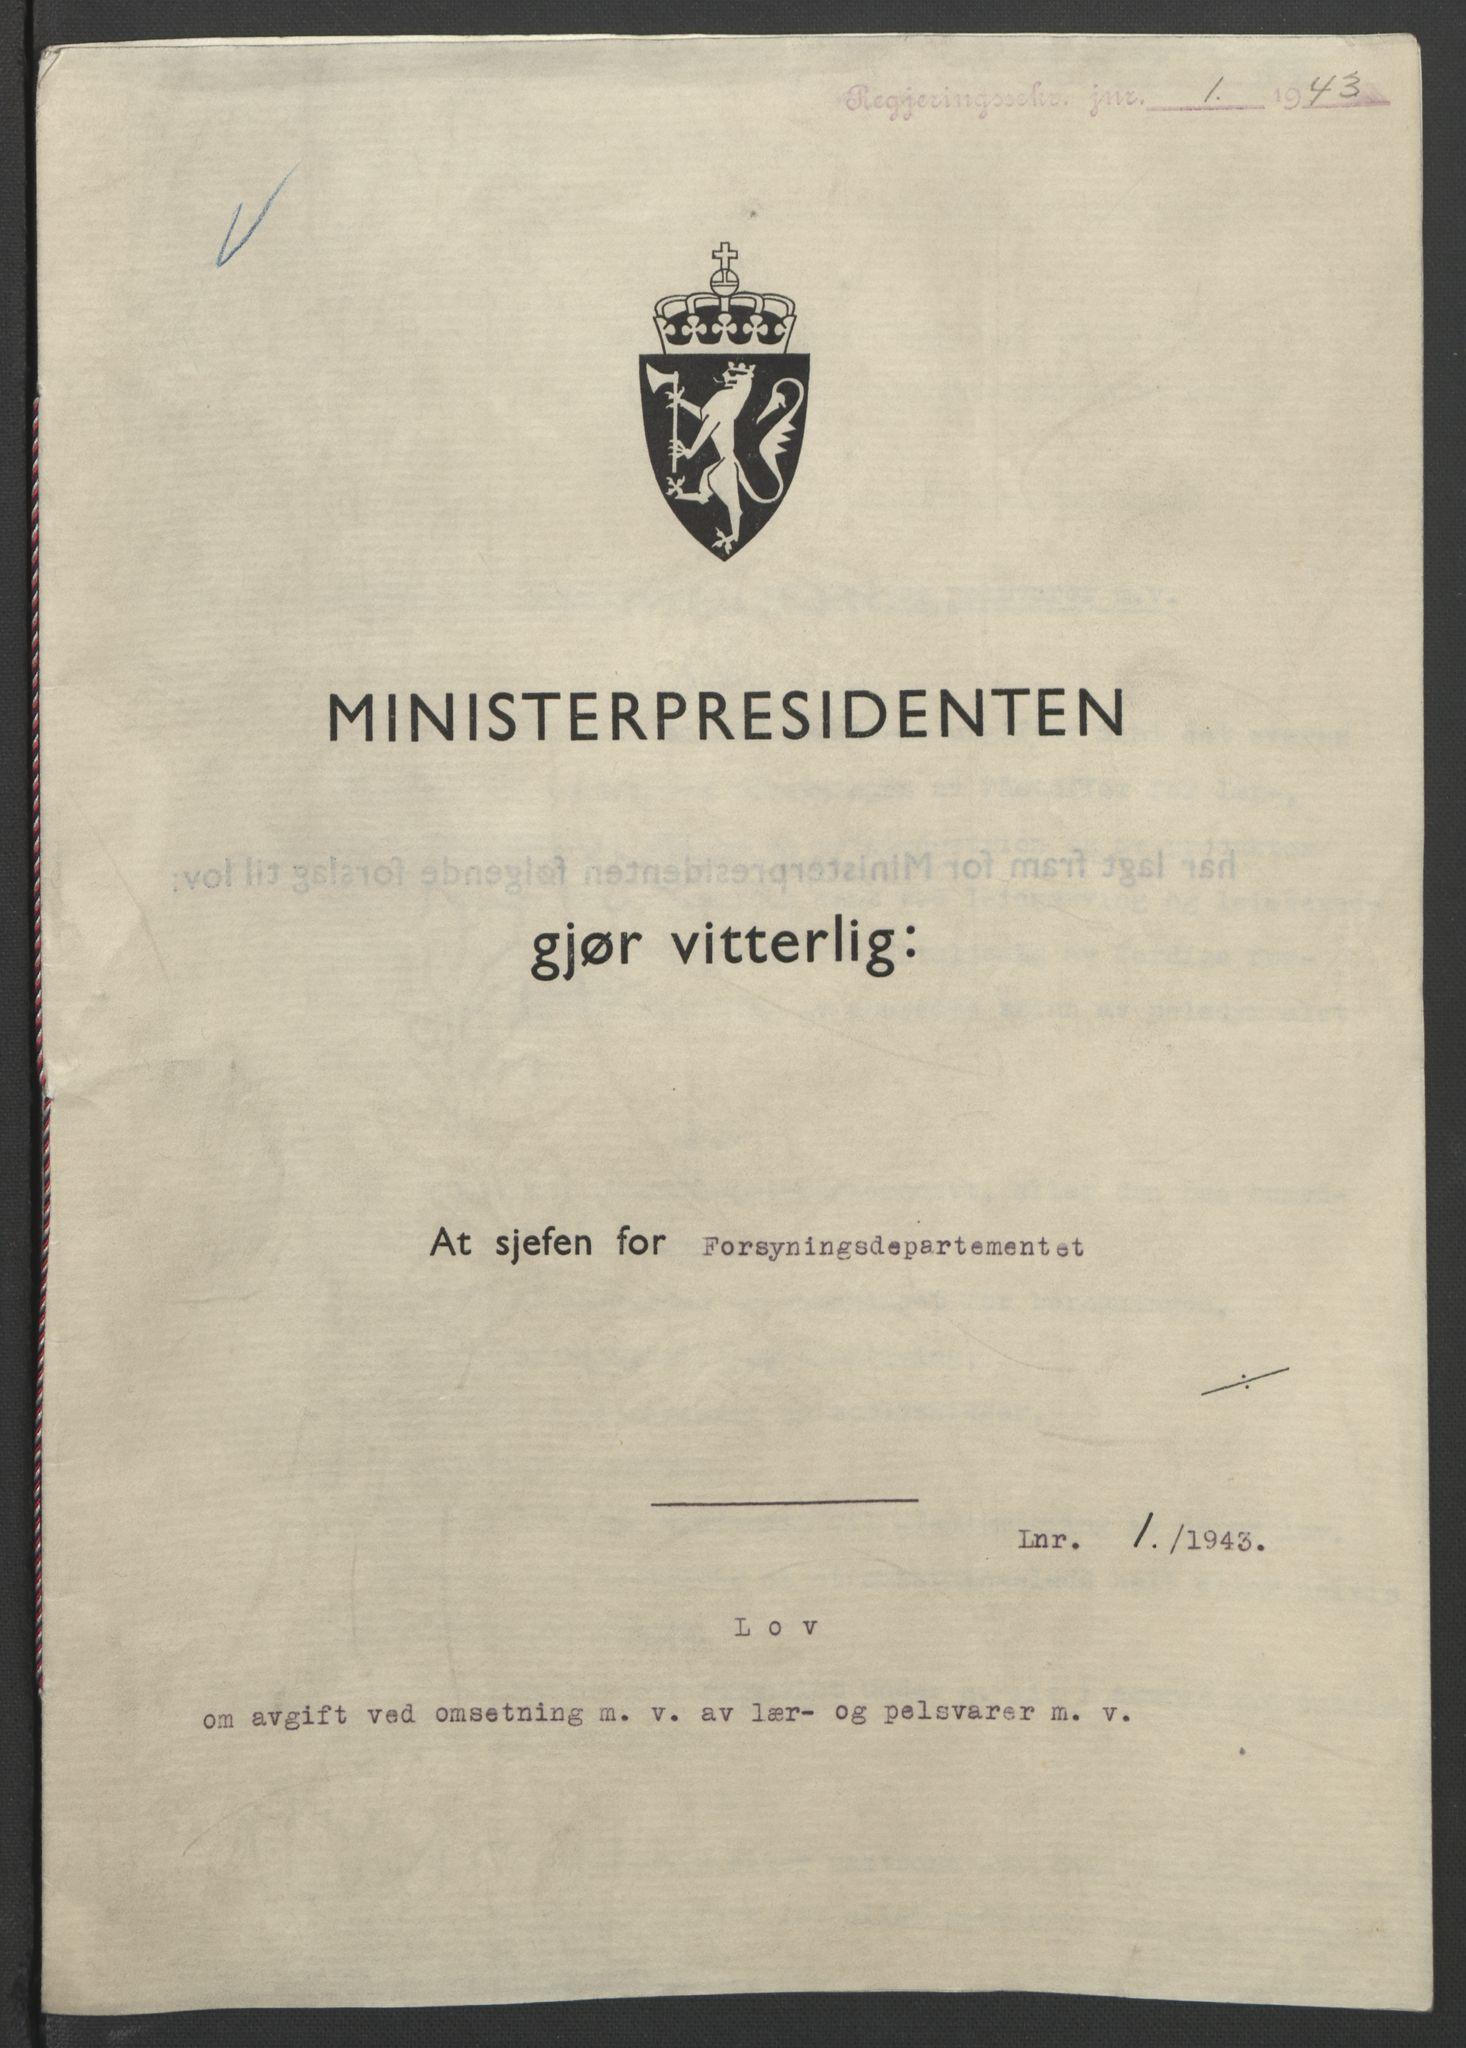 RA, NS-administrasjonen 1940-1945 (Statsrådsekretariatet, de kommisariske statsråder mm), D/Db/L0099: Lover, 1943, s. 2